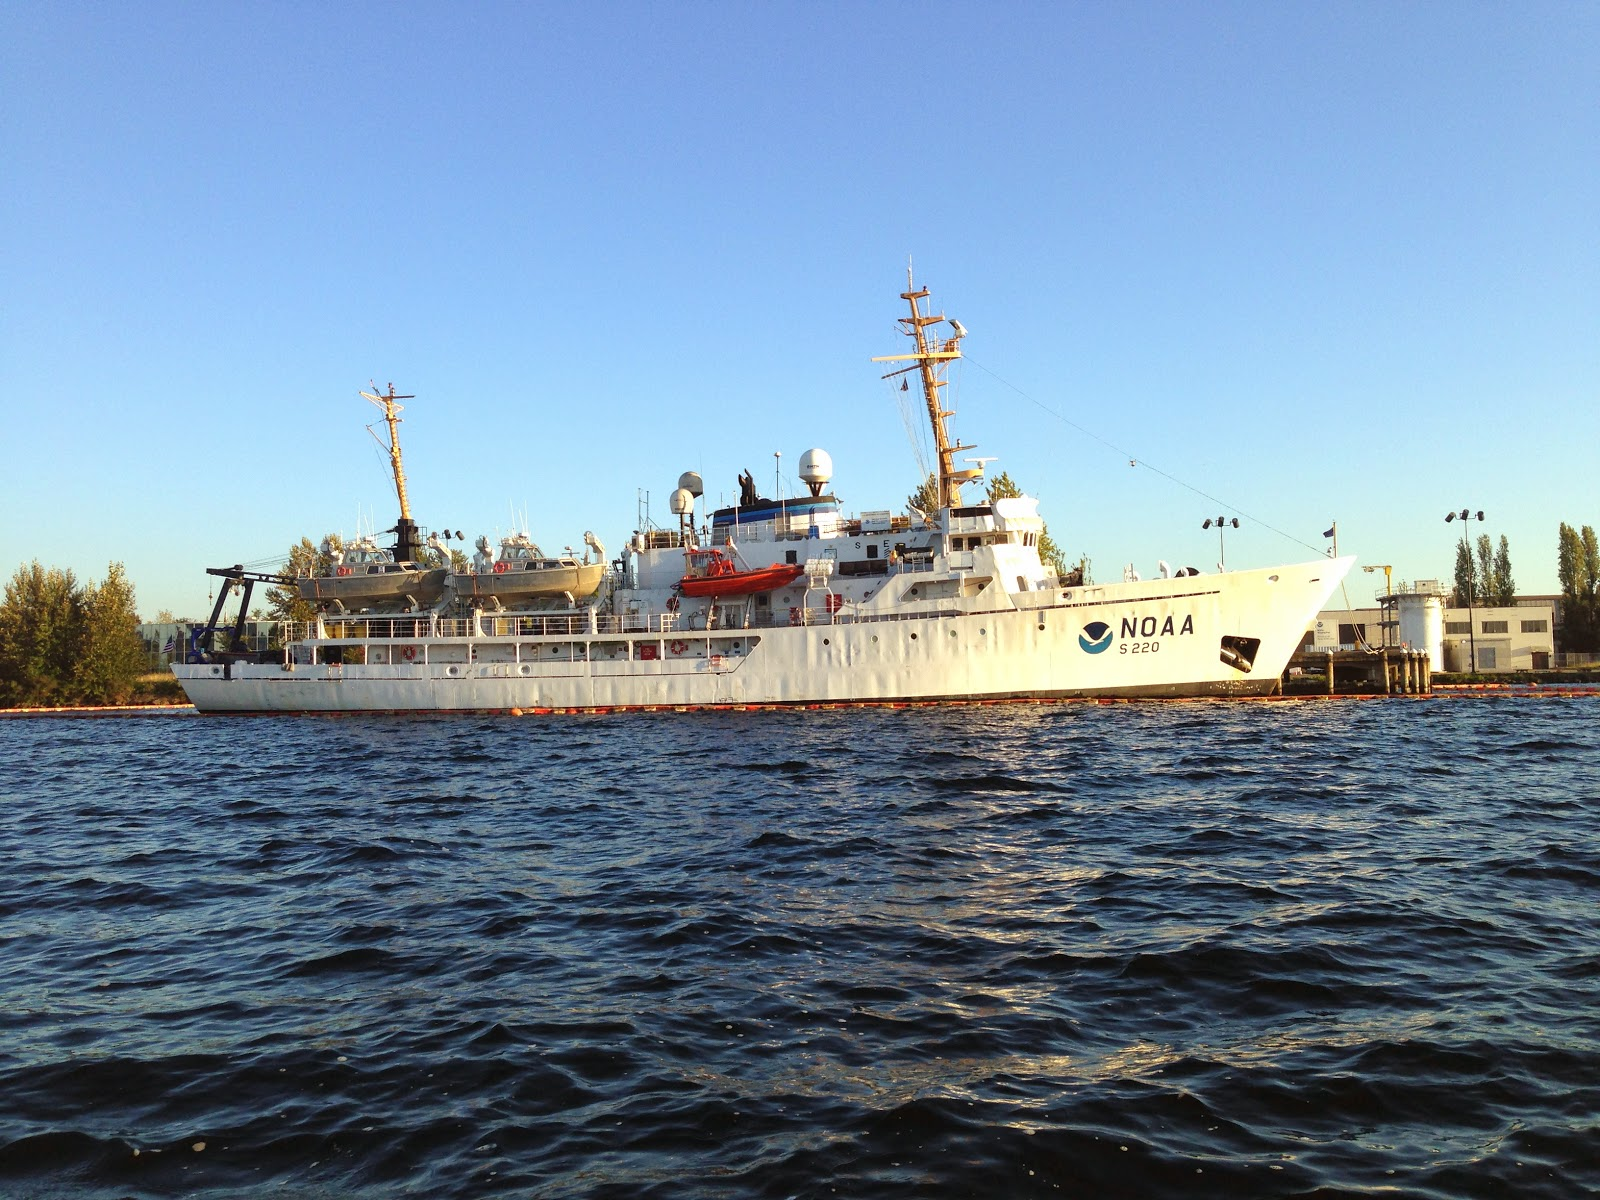 The NOAA Fairweather Hydrographic Survey Vessel